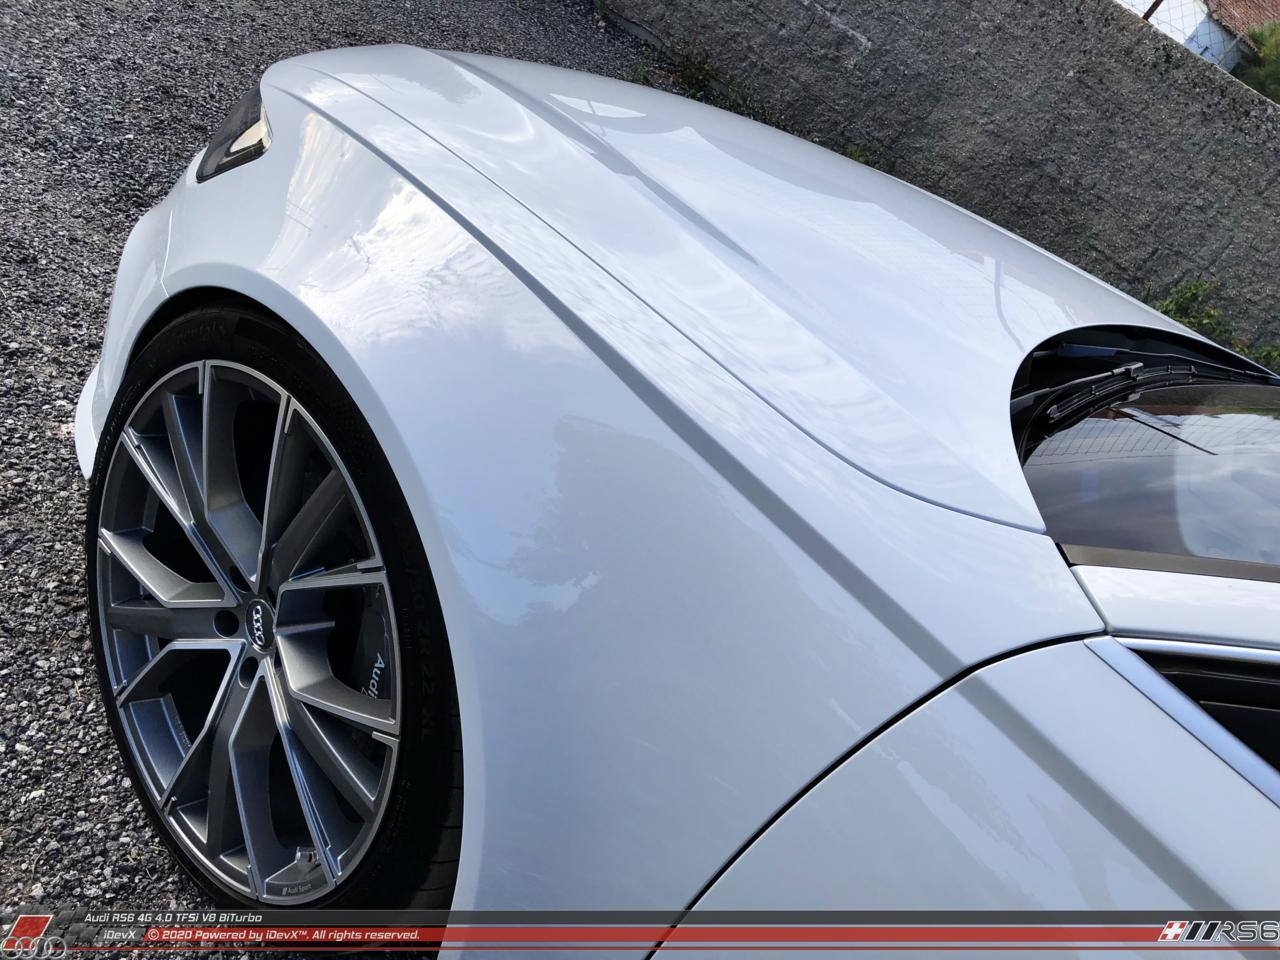 05_08.2019_Audi-RS6_iDevX_040.png